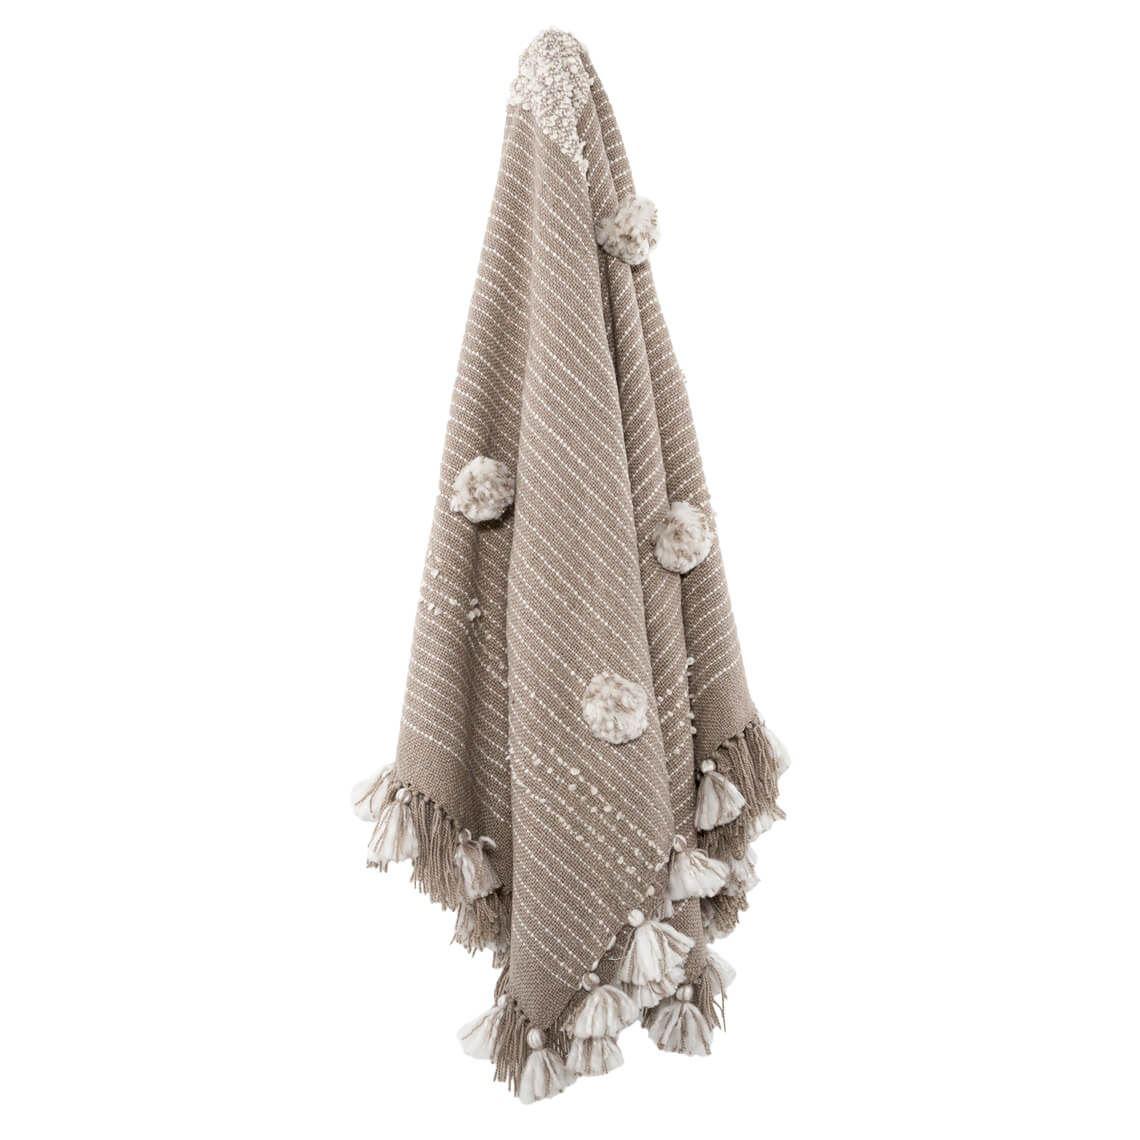 Ounni Throw Size W 34cm x D 46cm x H 7cm in Natural/Grey Freedom